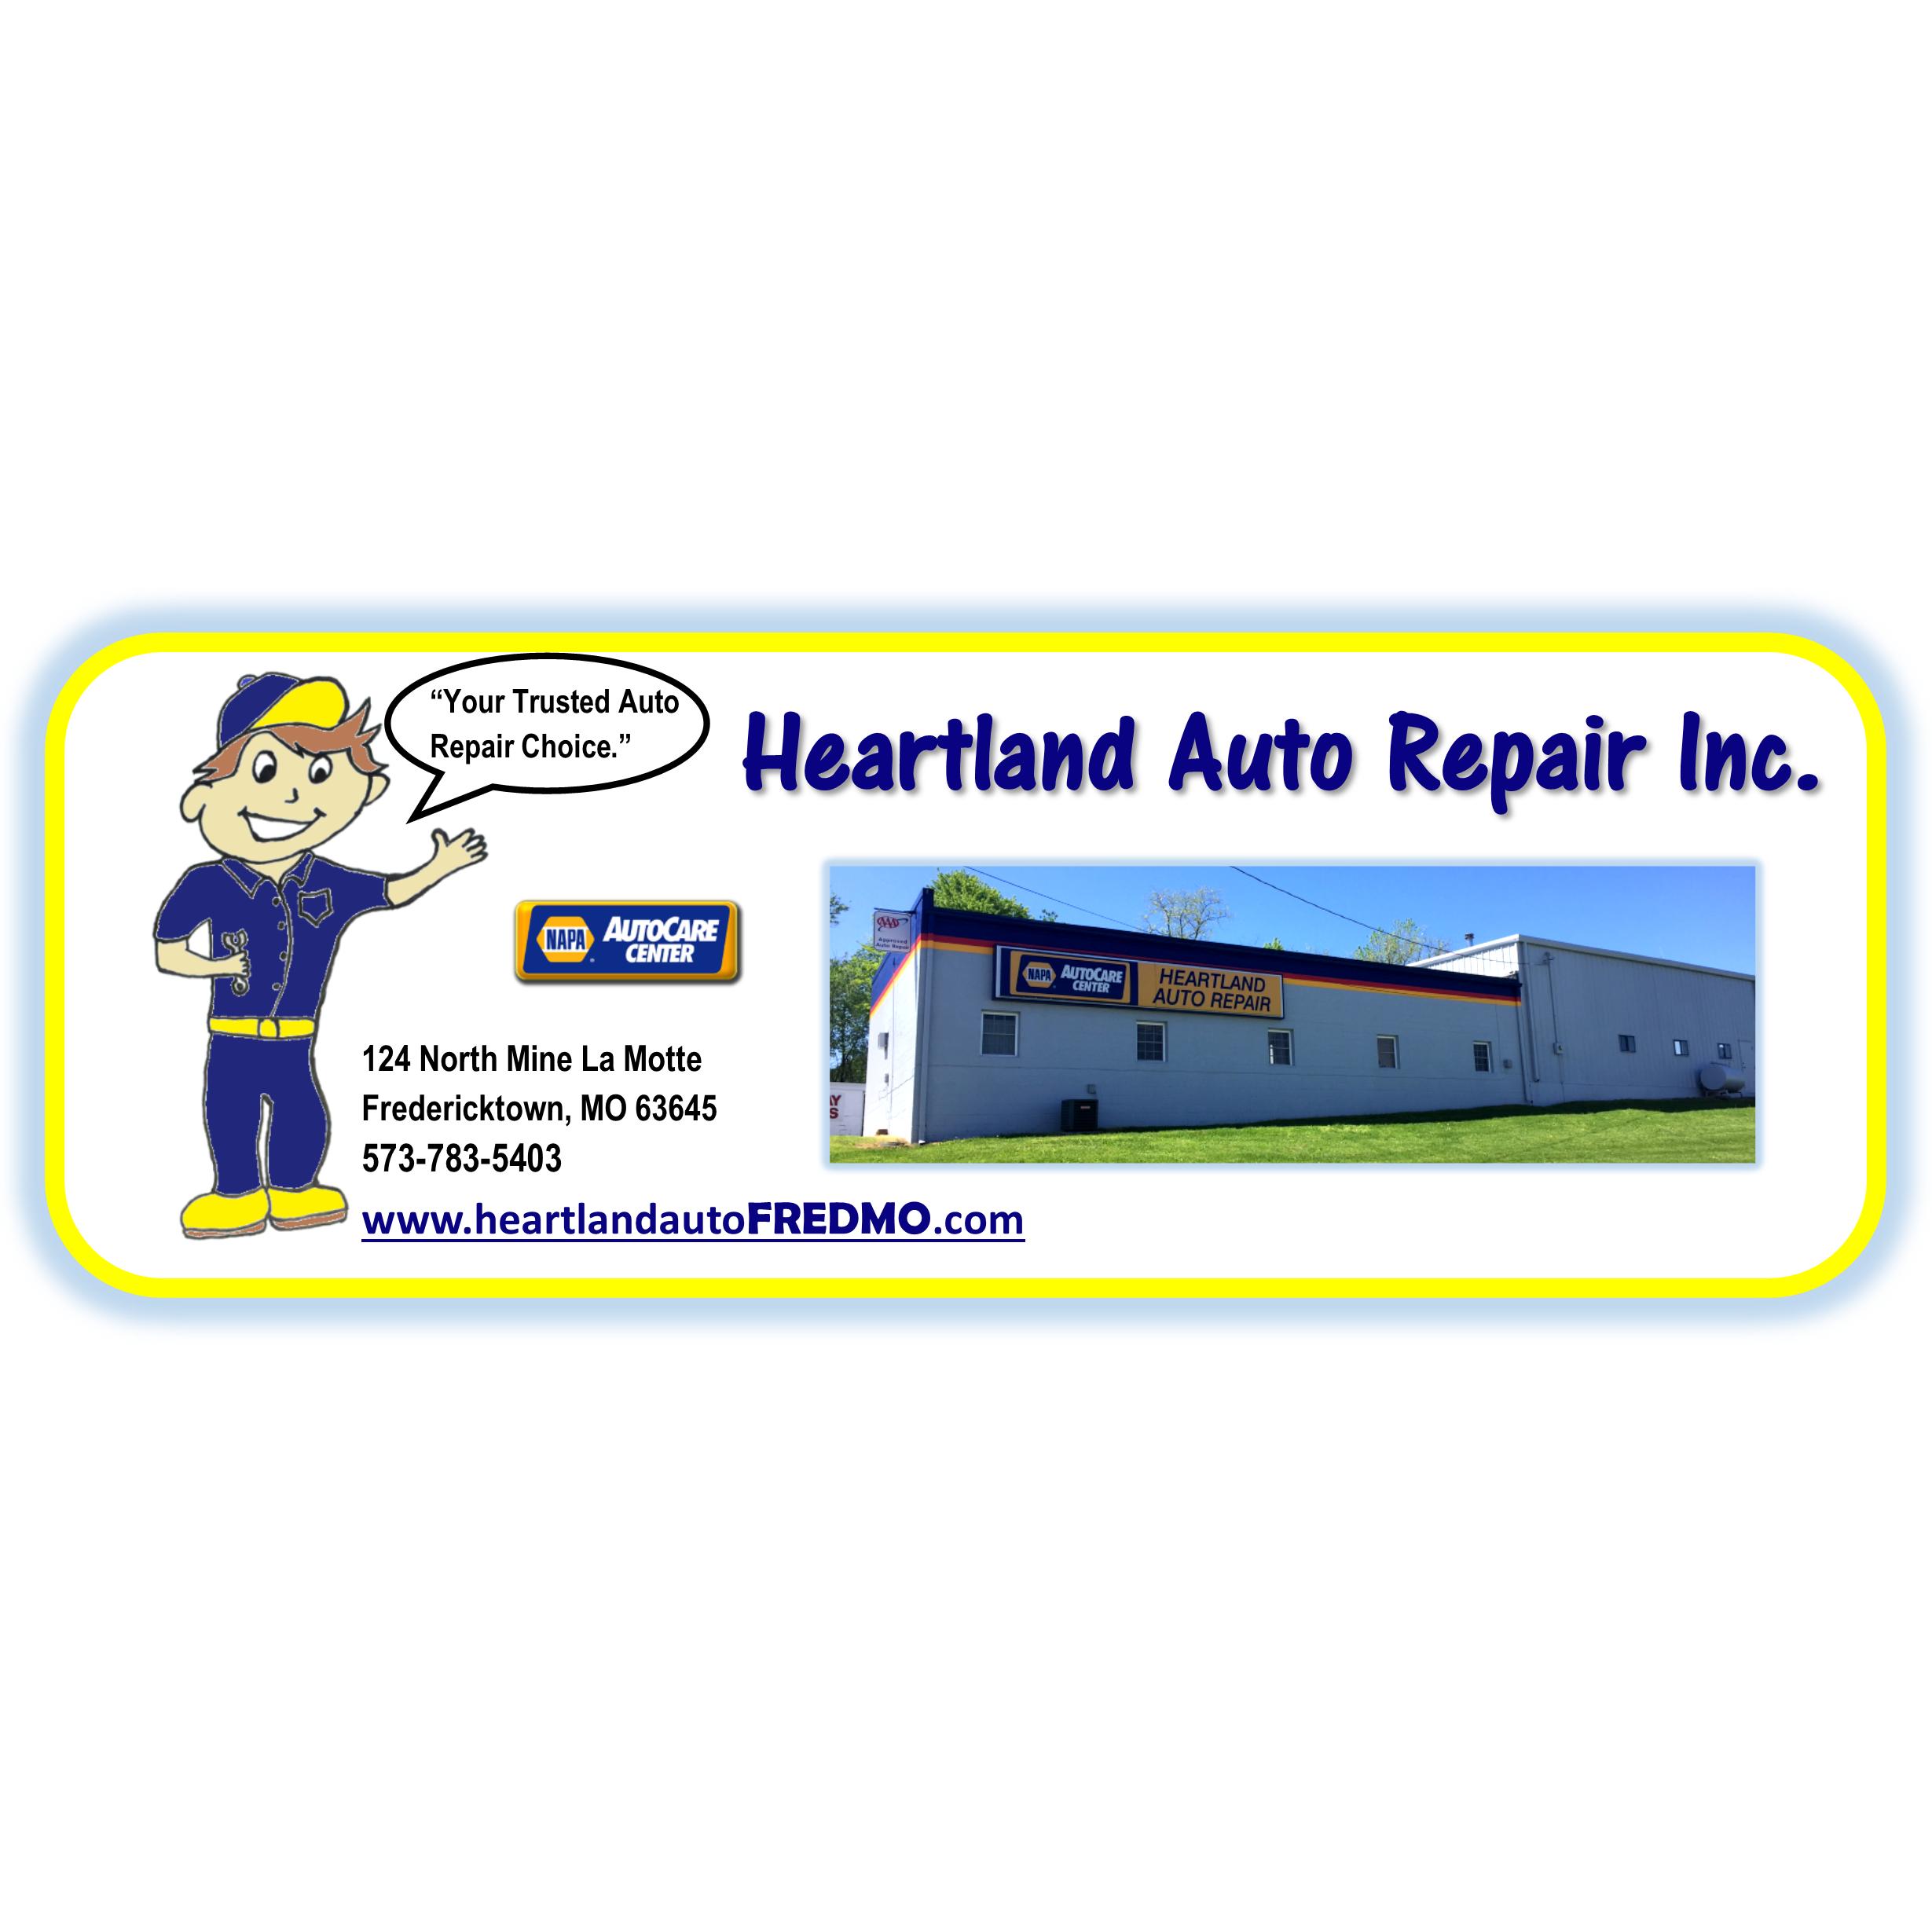 Heartland Auto Repair Inc.